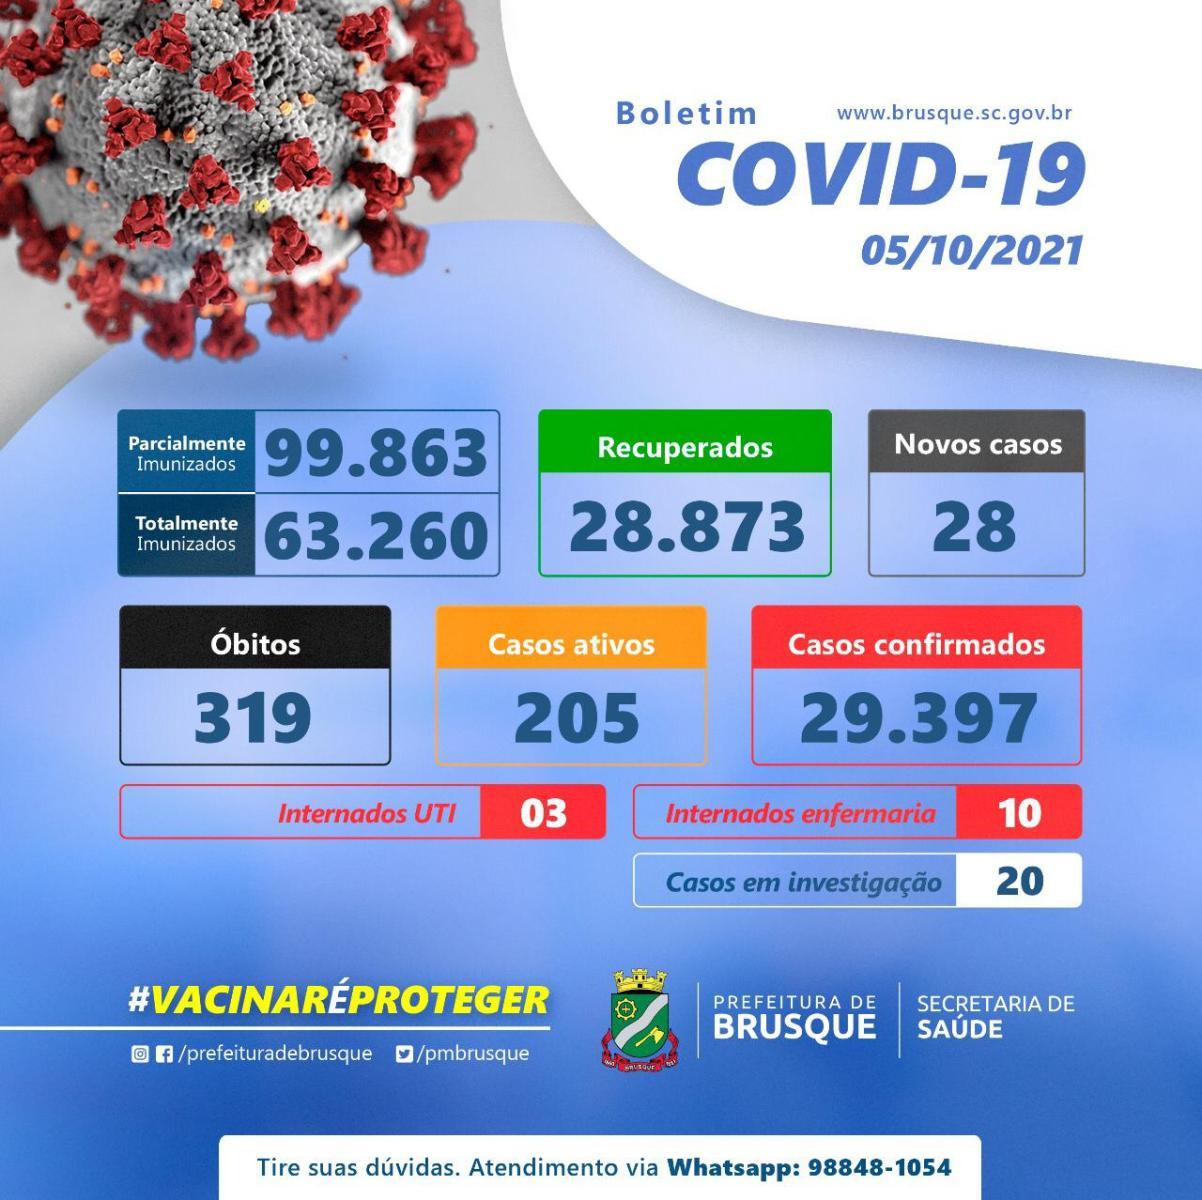 Covid-19: Confira o boletim epidemiológico desta terça-feira (05)